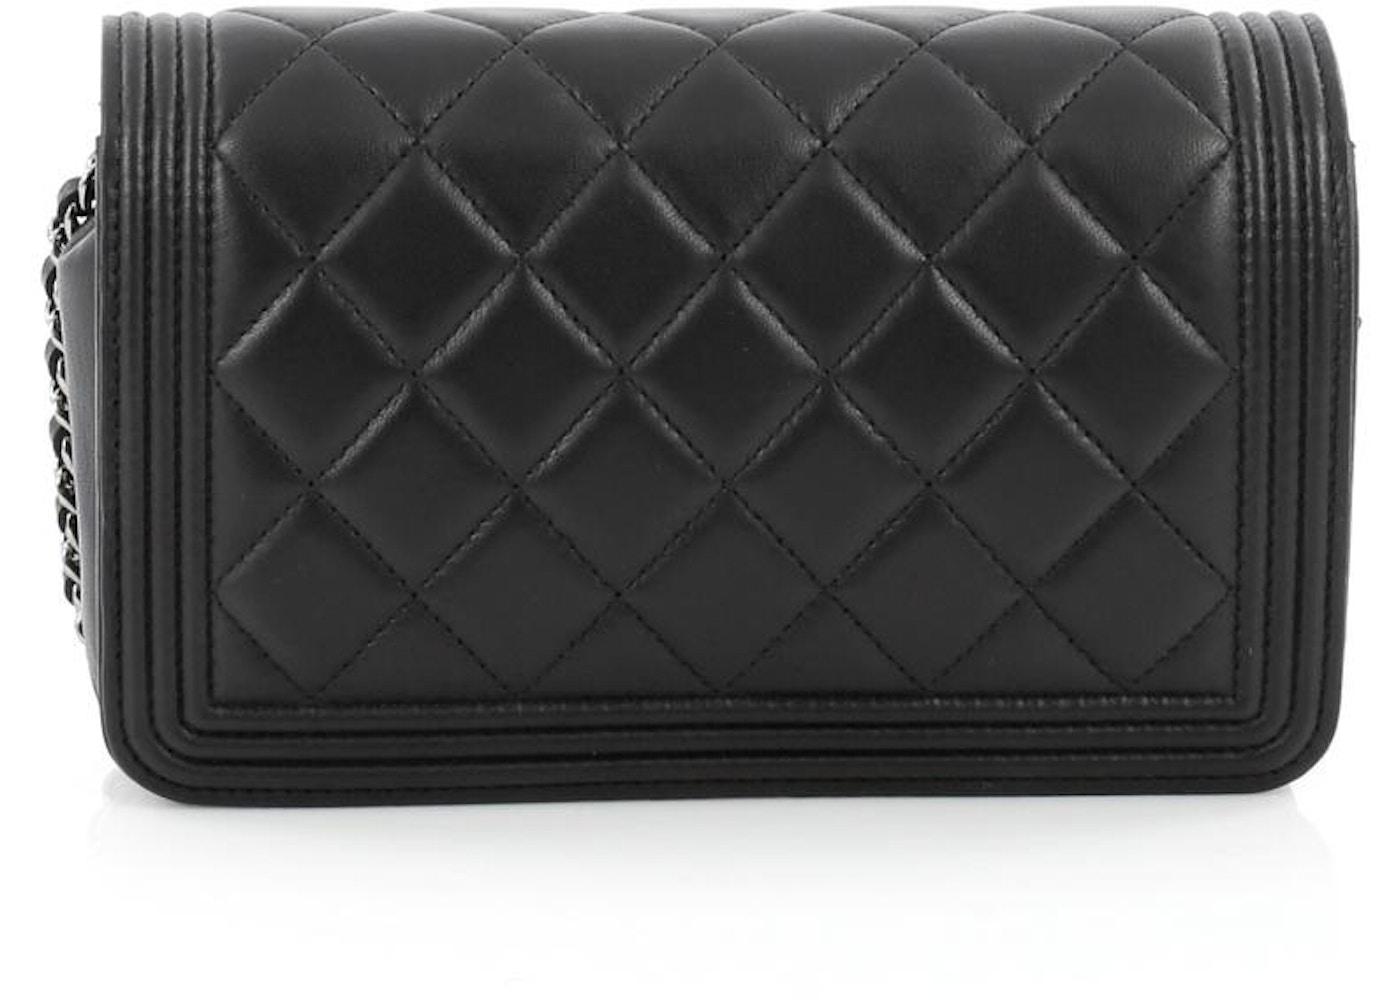 386bc20f2cb4a2 Buy & Sell Chanel WOC Handbags